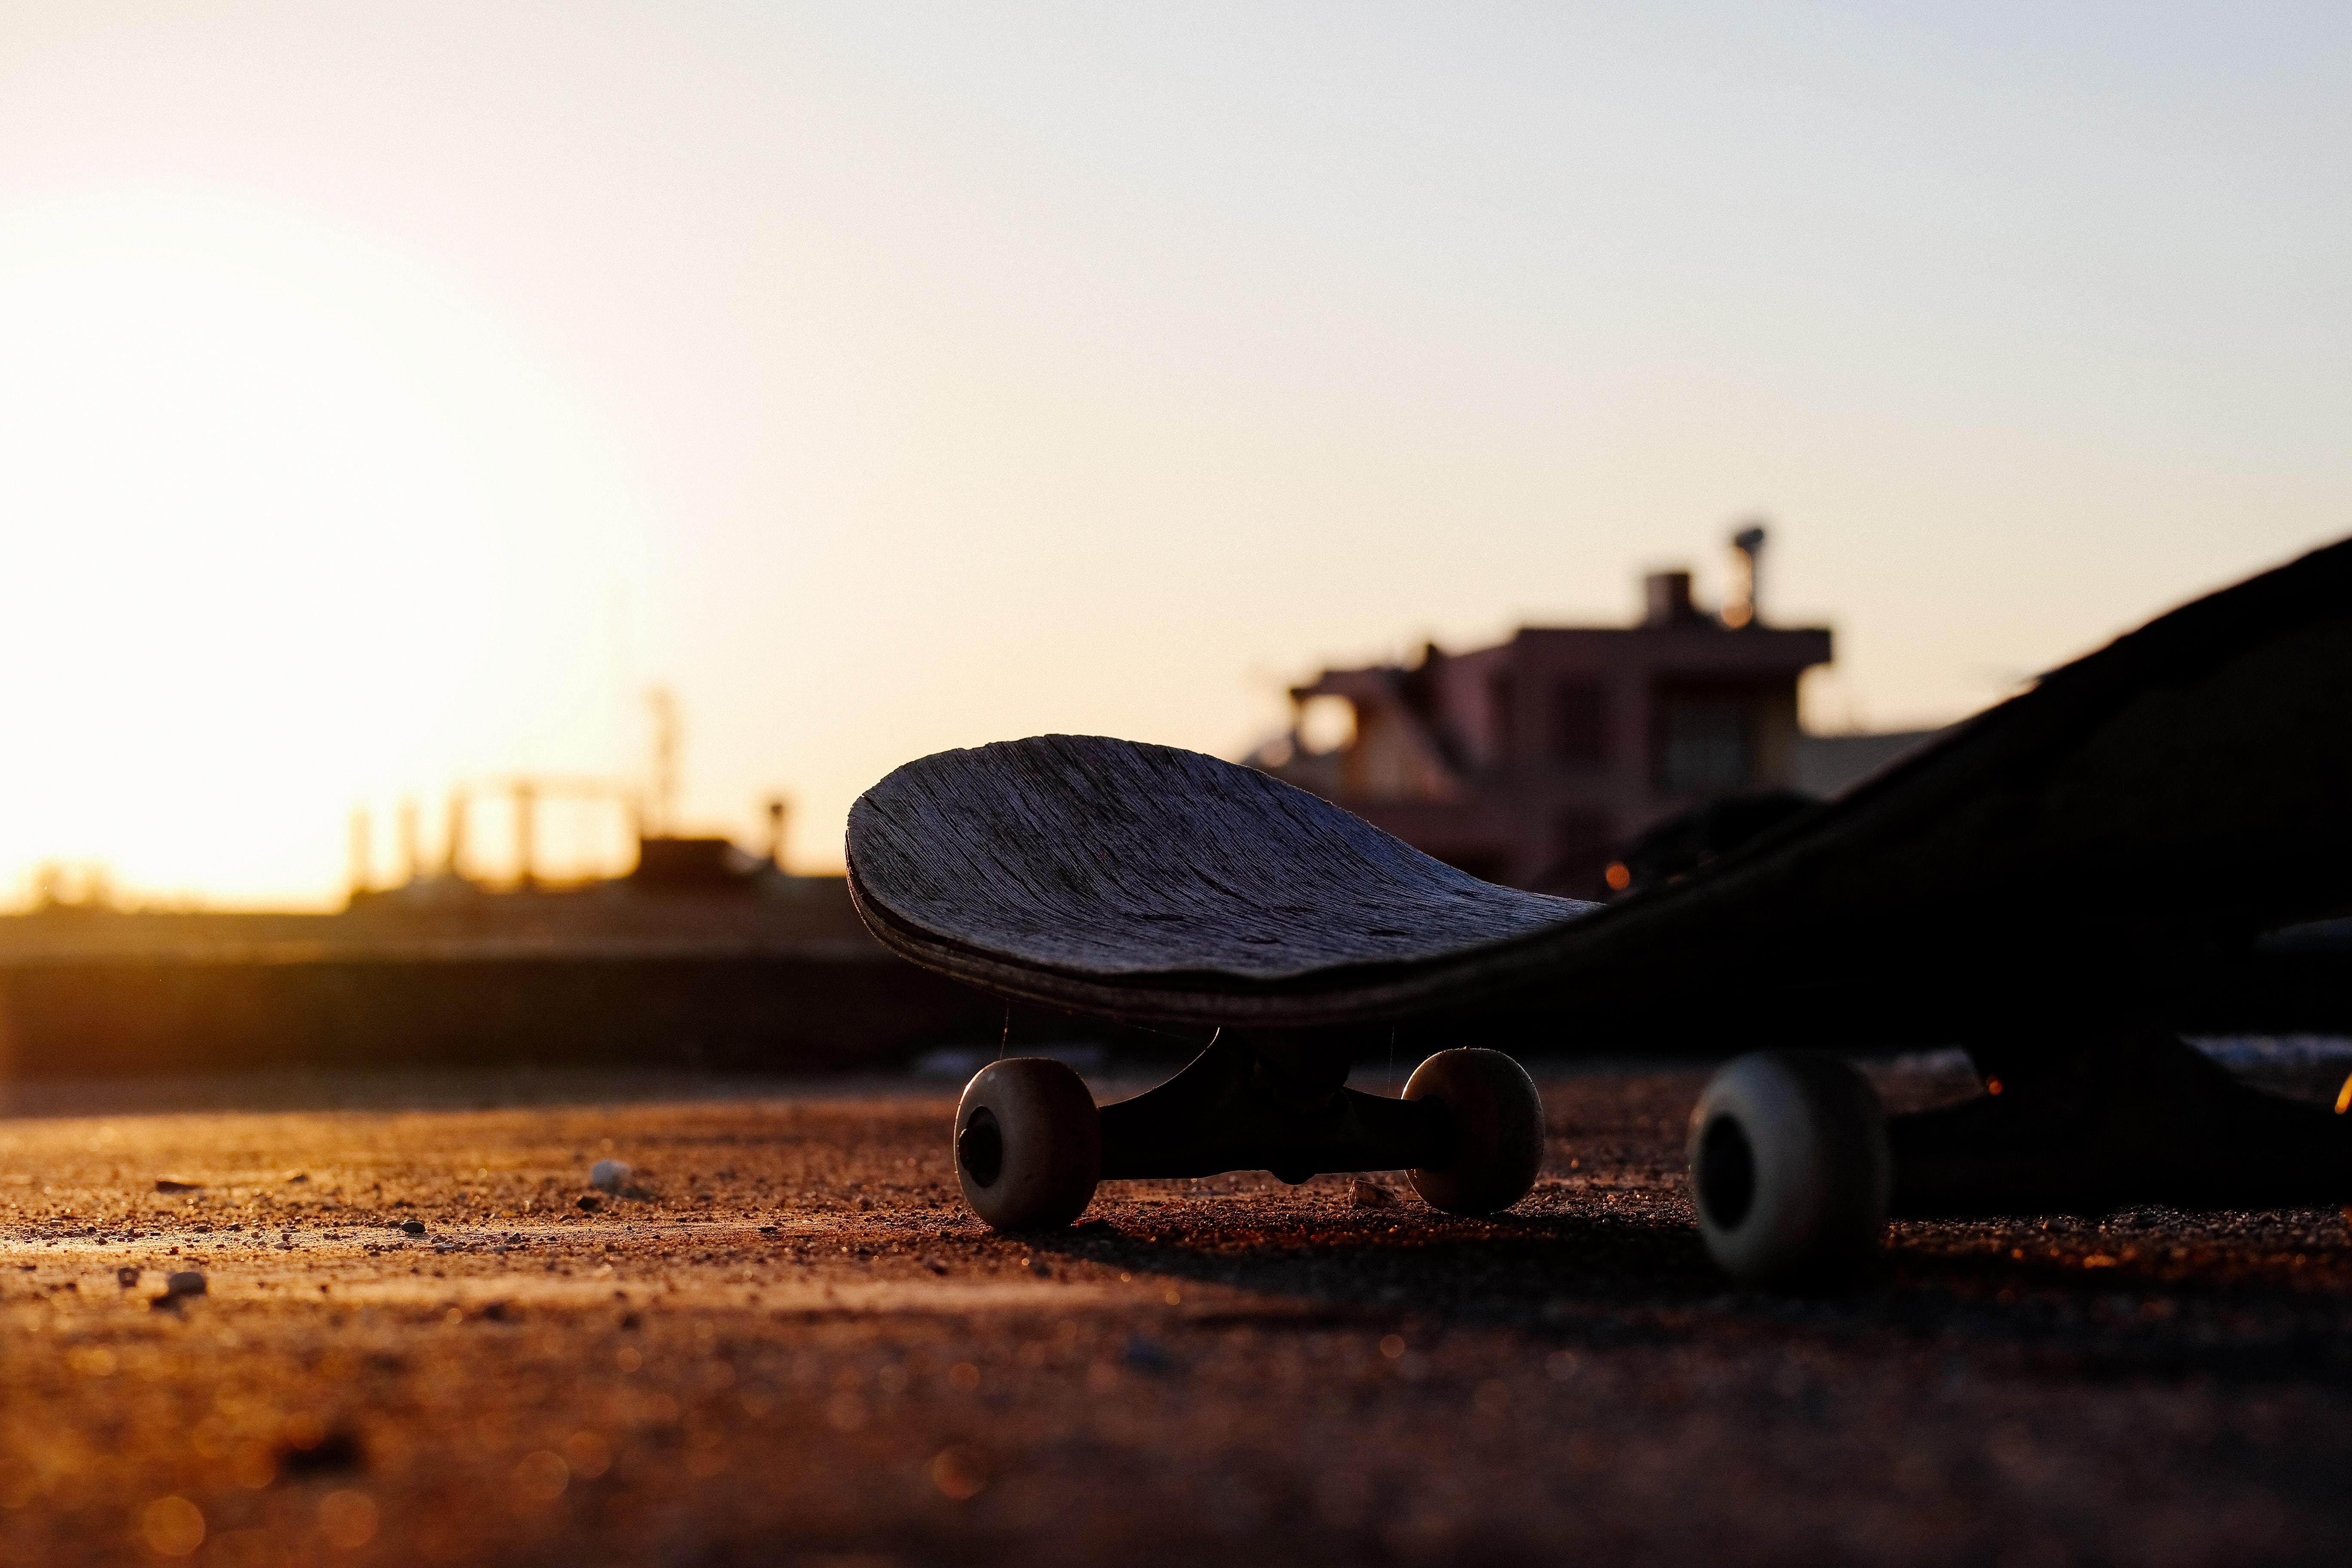 close-up photo of gray skateboard deck